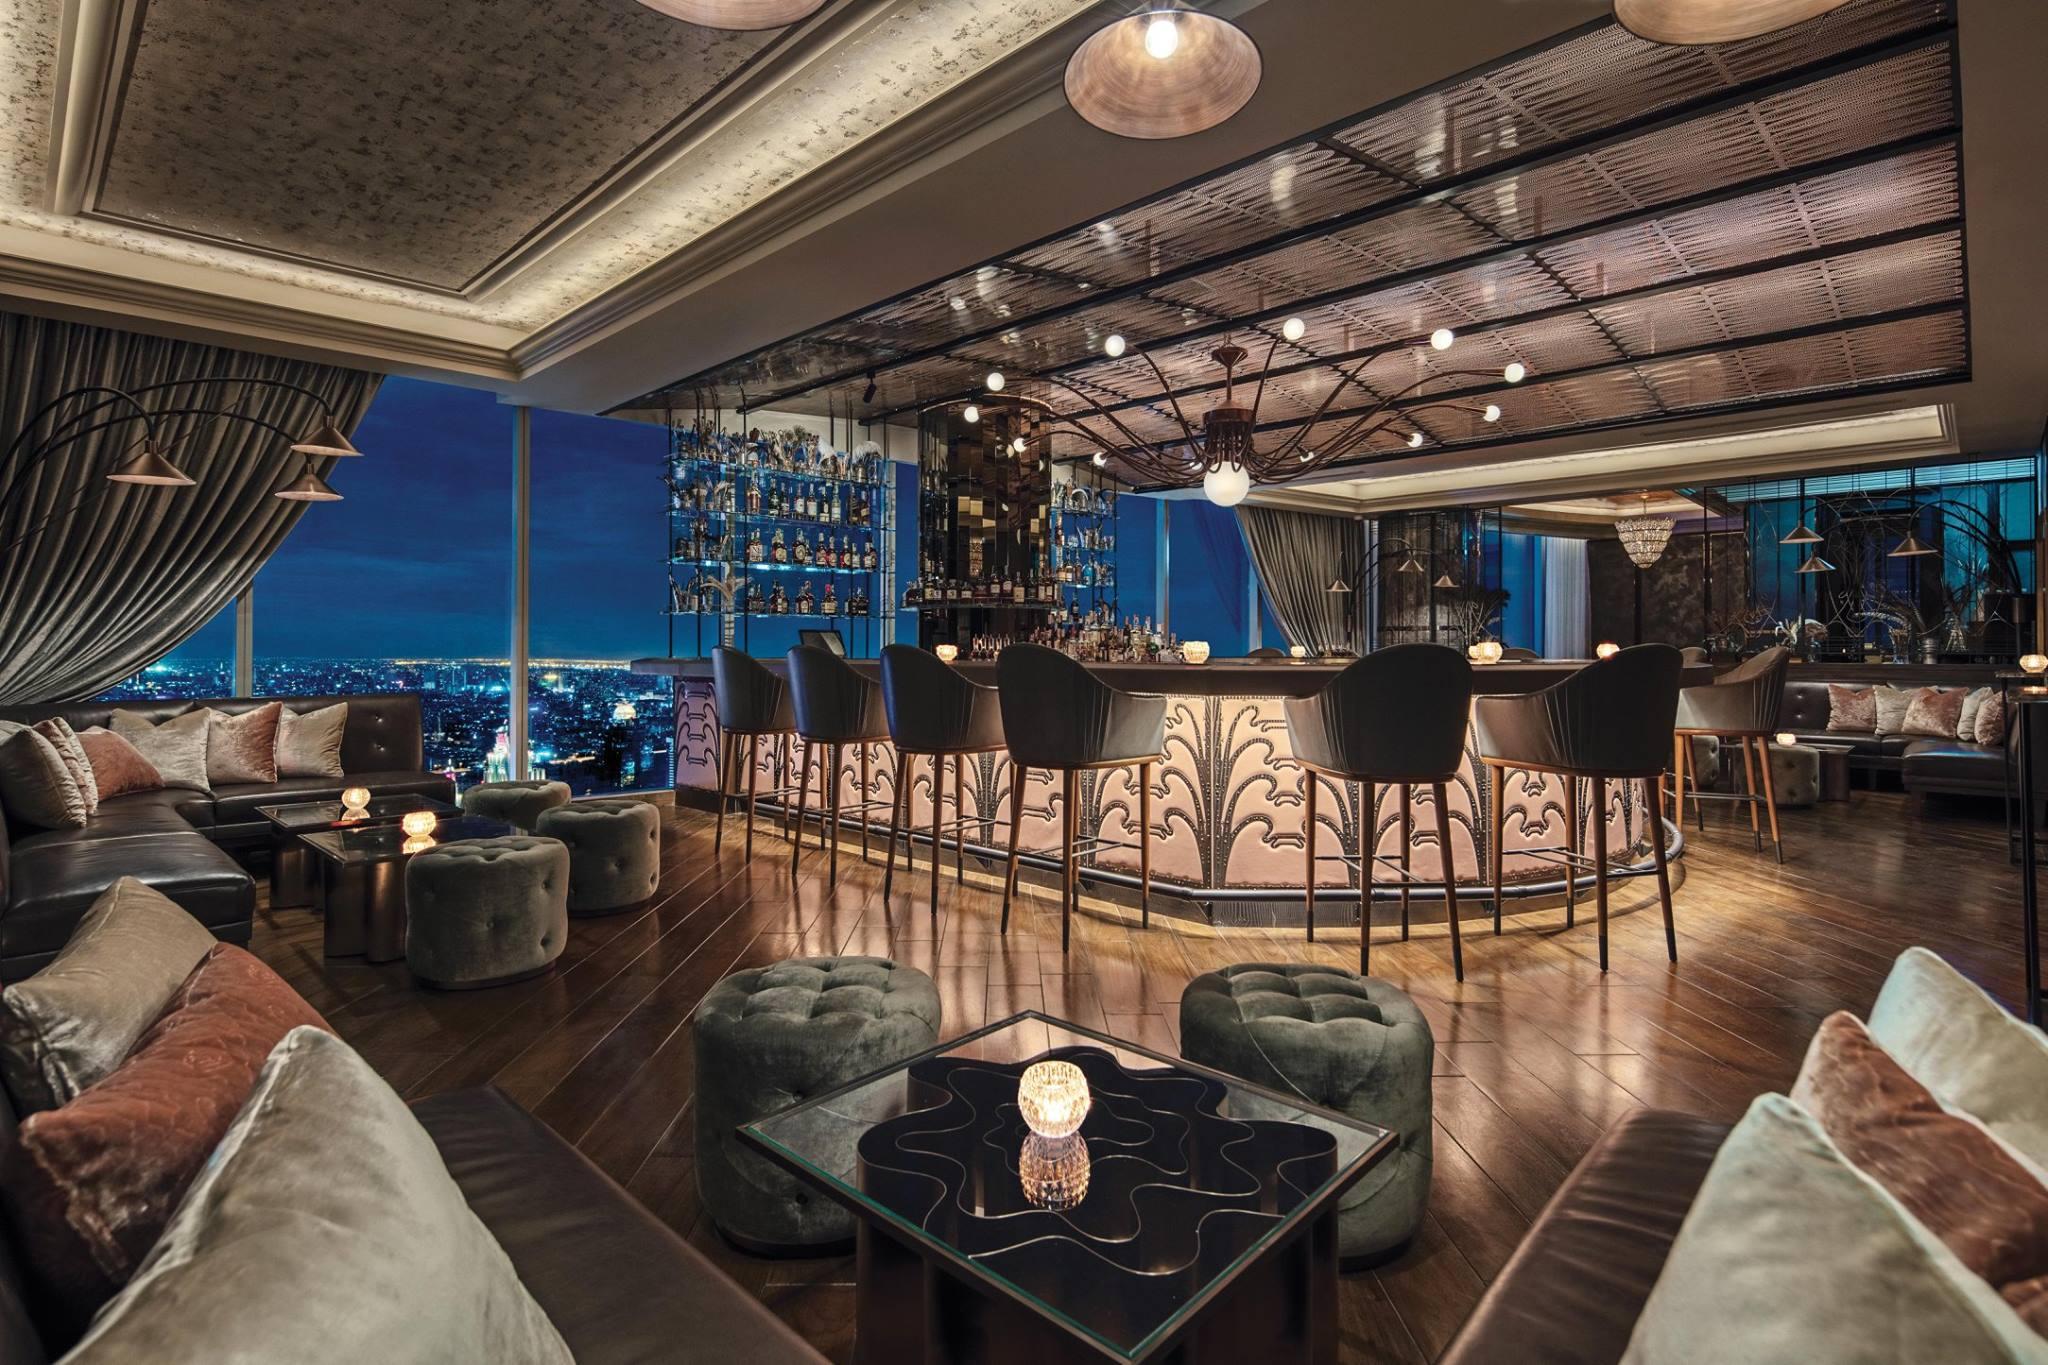 Best Rooftop Bar Bangkok, rooftop bar bangkok, sky bar bangkok, sky bar, bangkok bars, bangkok rooftop places, best rooftop bars in bangkok, top rooftop bars, bangkok best sky bars, sky bars, popular rooftop bars, new rooftop bars bangkok, best speakeasies bangkok, The Loft, Waldorf Astoria, The loft bar,